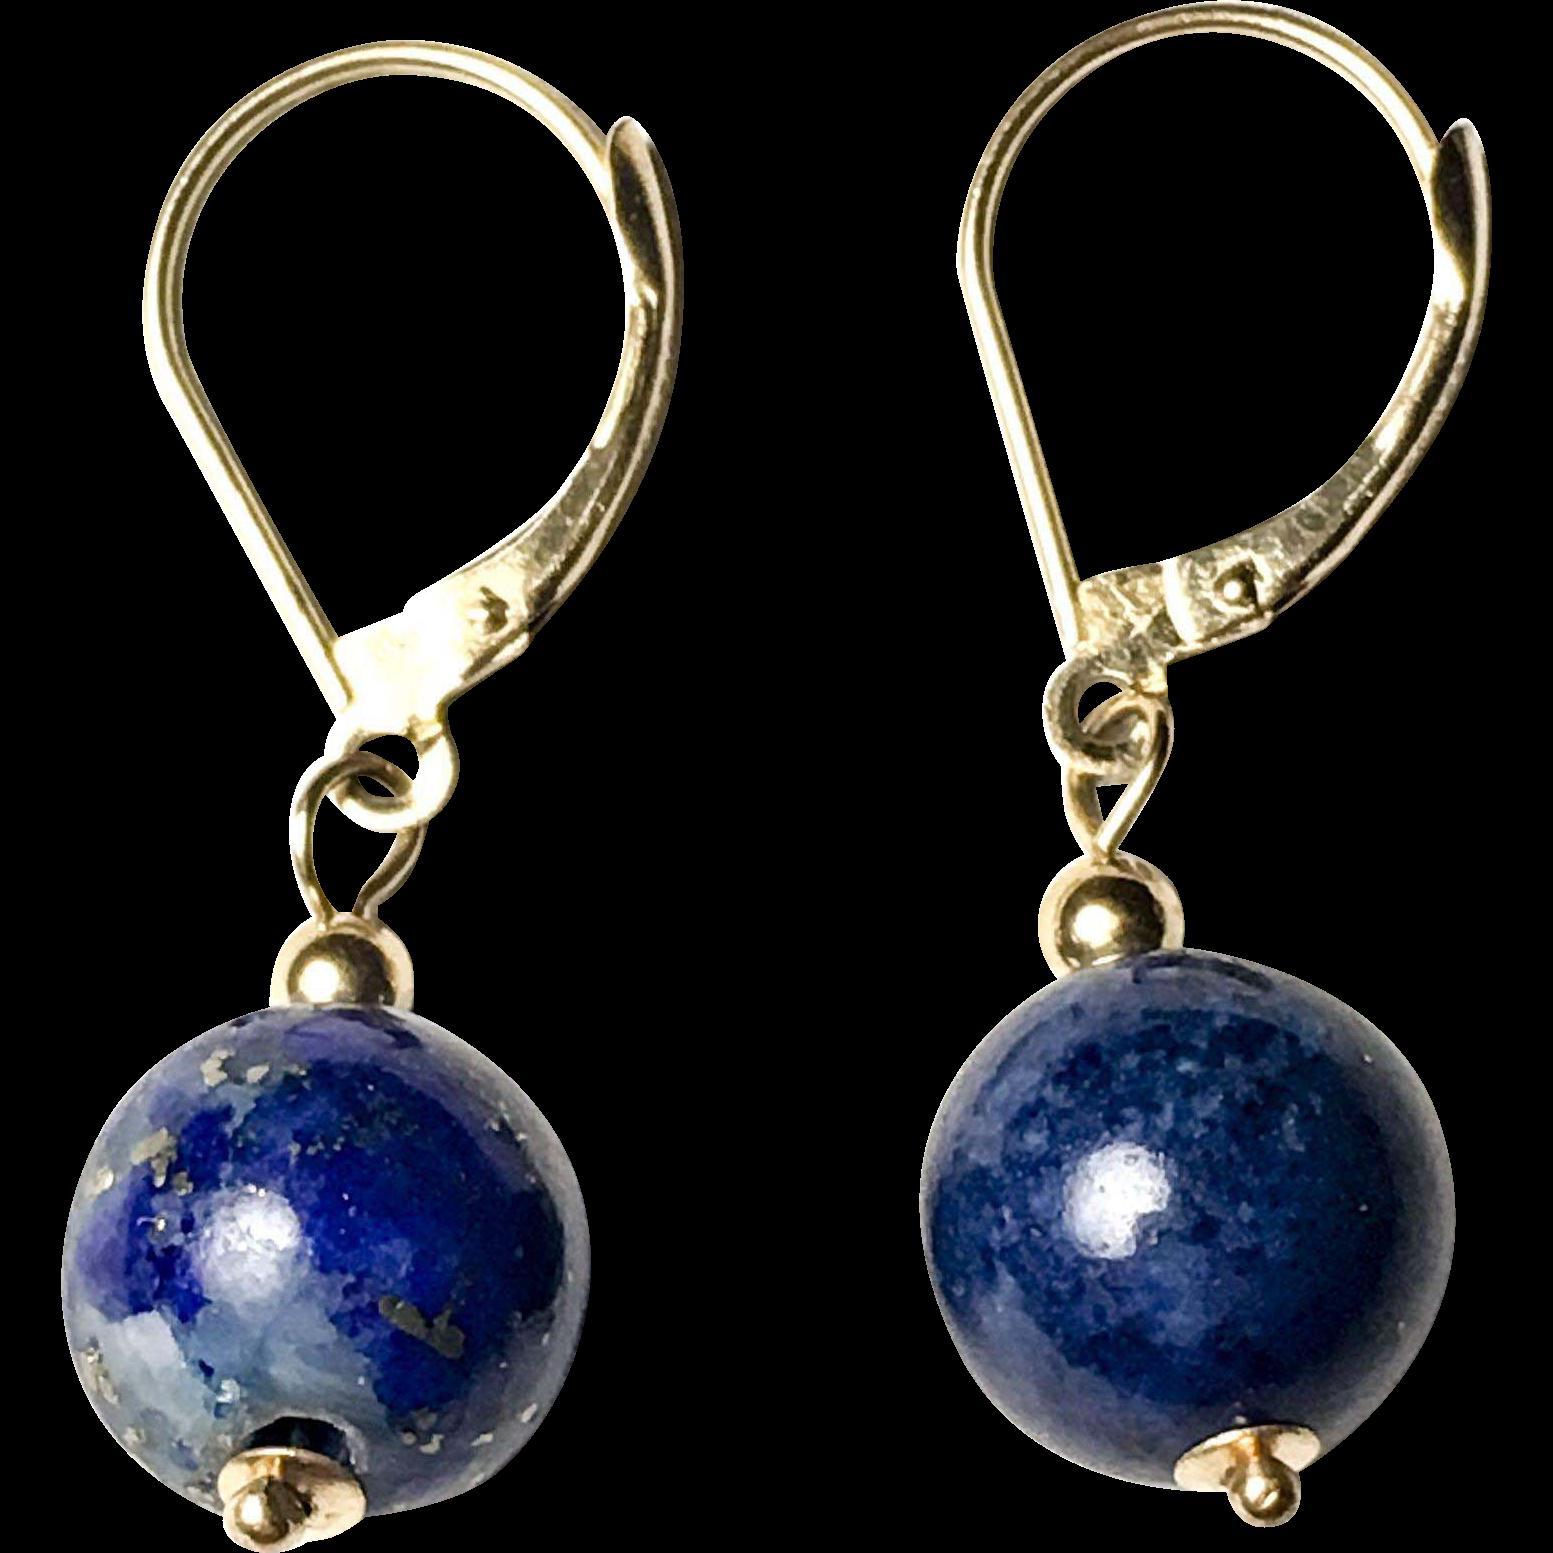 Vintage Lapiz Lazuli Drop Earrings 14k Gold